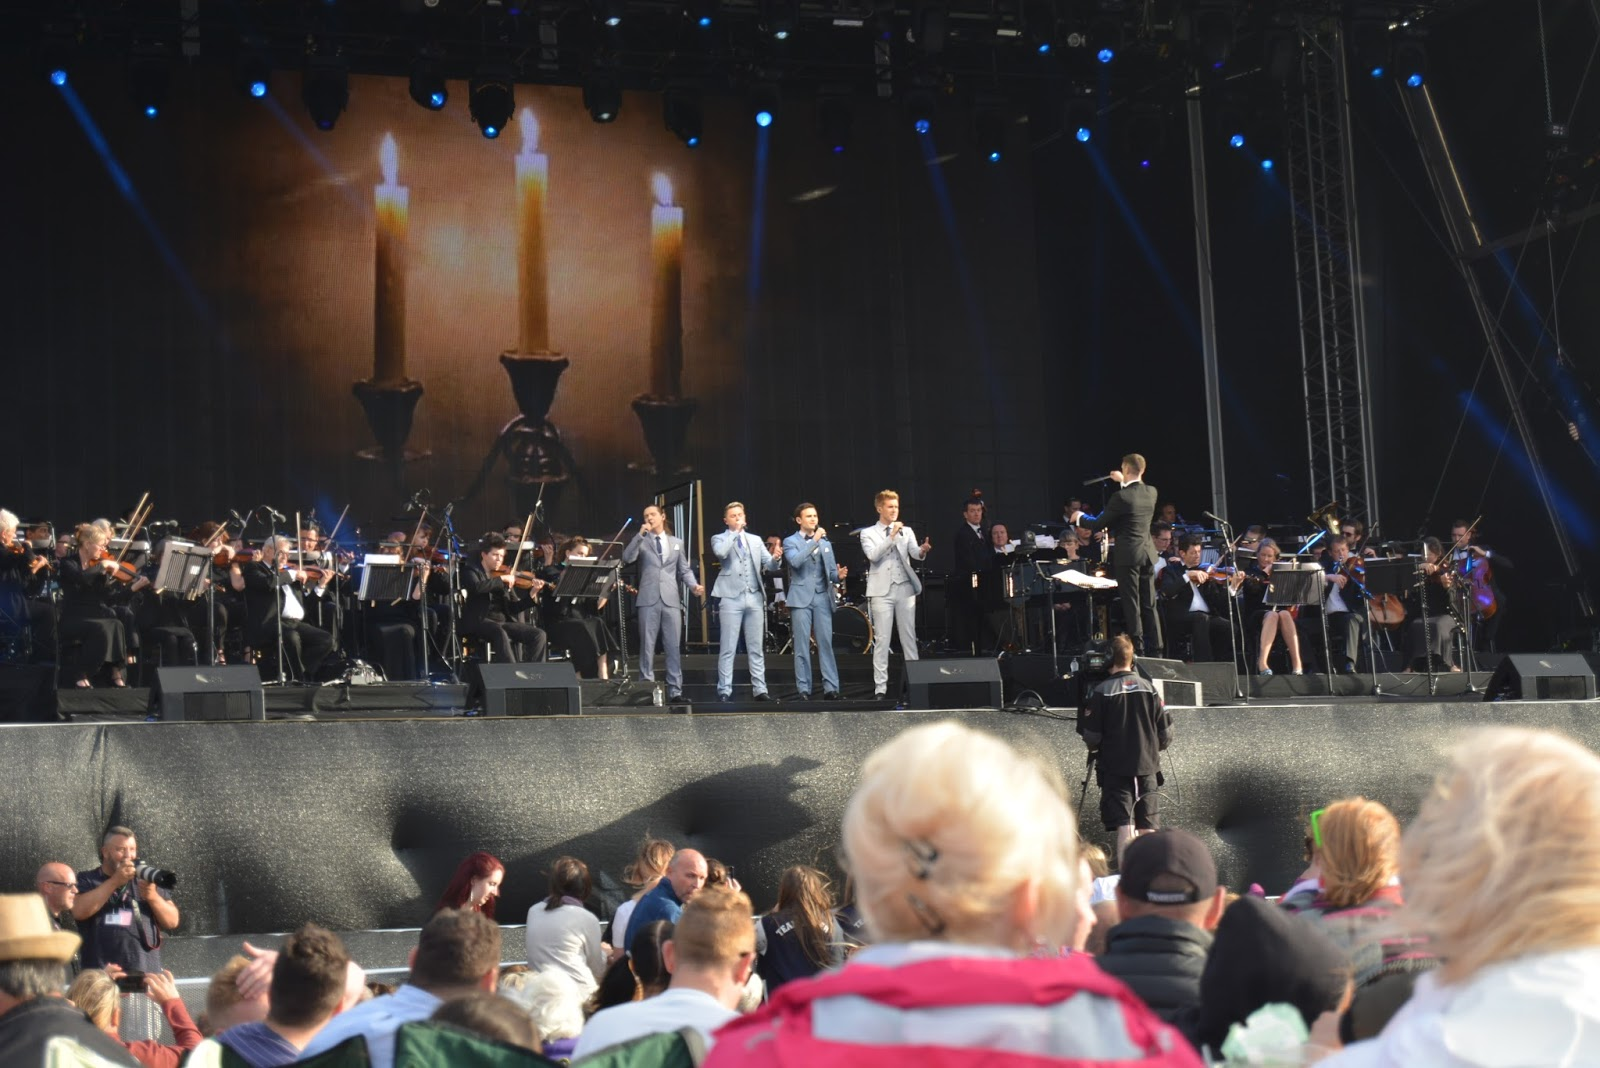 collabro, music, britains got talent, west end, musicals, lytham festival, the proms,